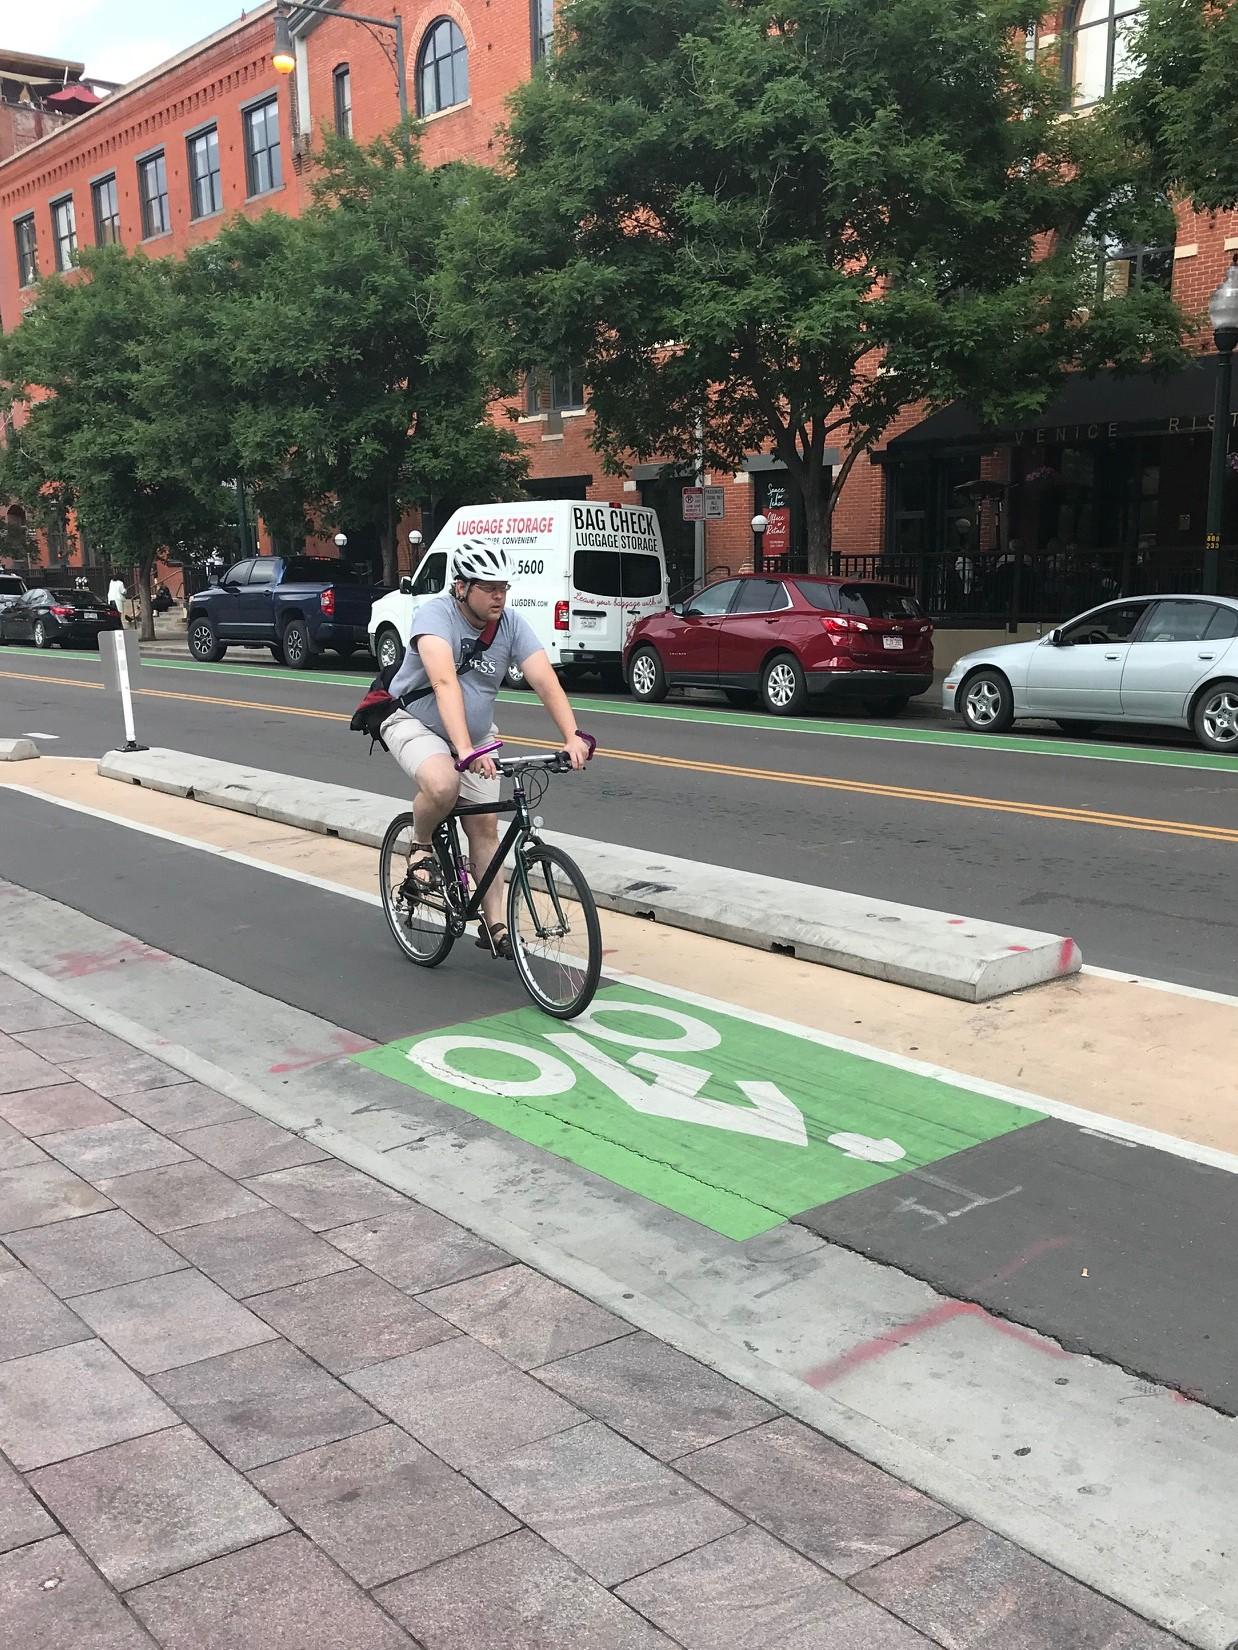 Denver has 130 miles of bike lanes